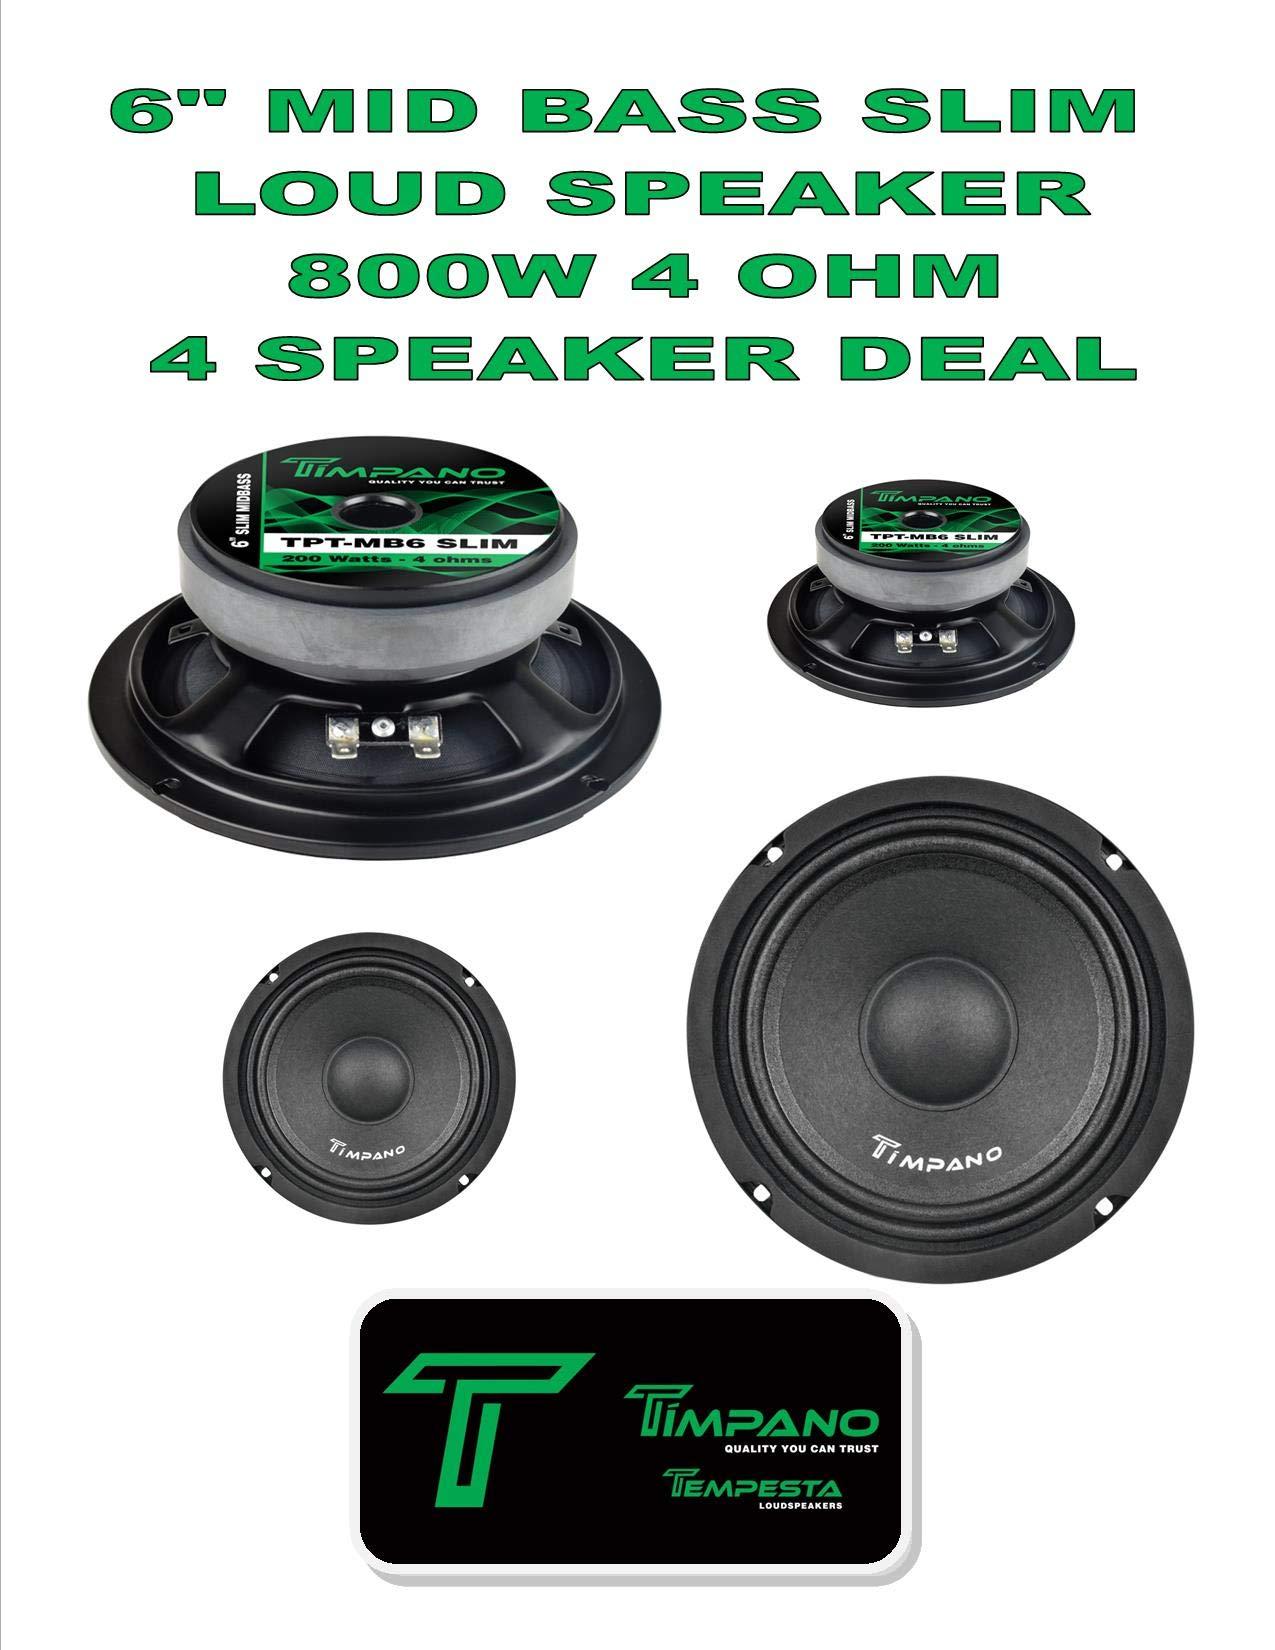 Timpano TPT-MB6 Slim 6'' 4 Ohm (800W Peak) 94 dB Slim Mid-Bass Loudspeaker 2 Pair